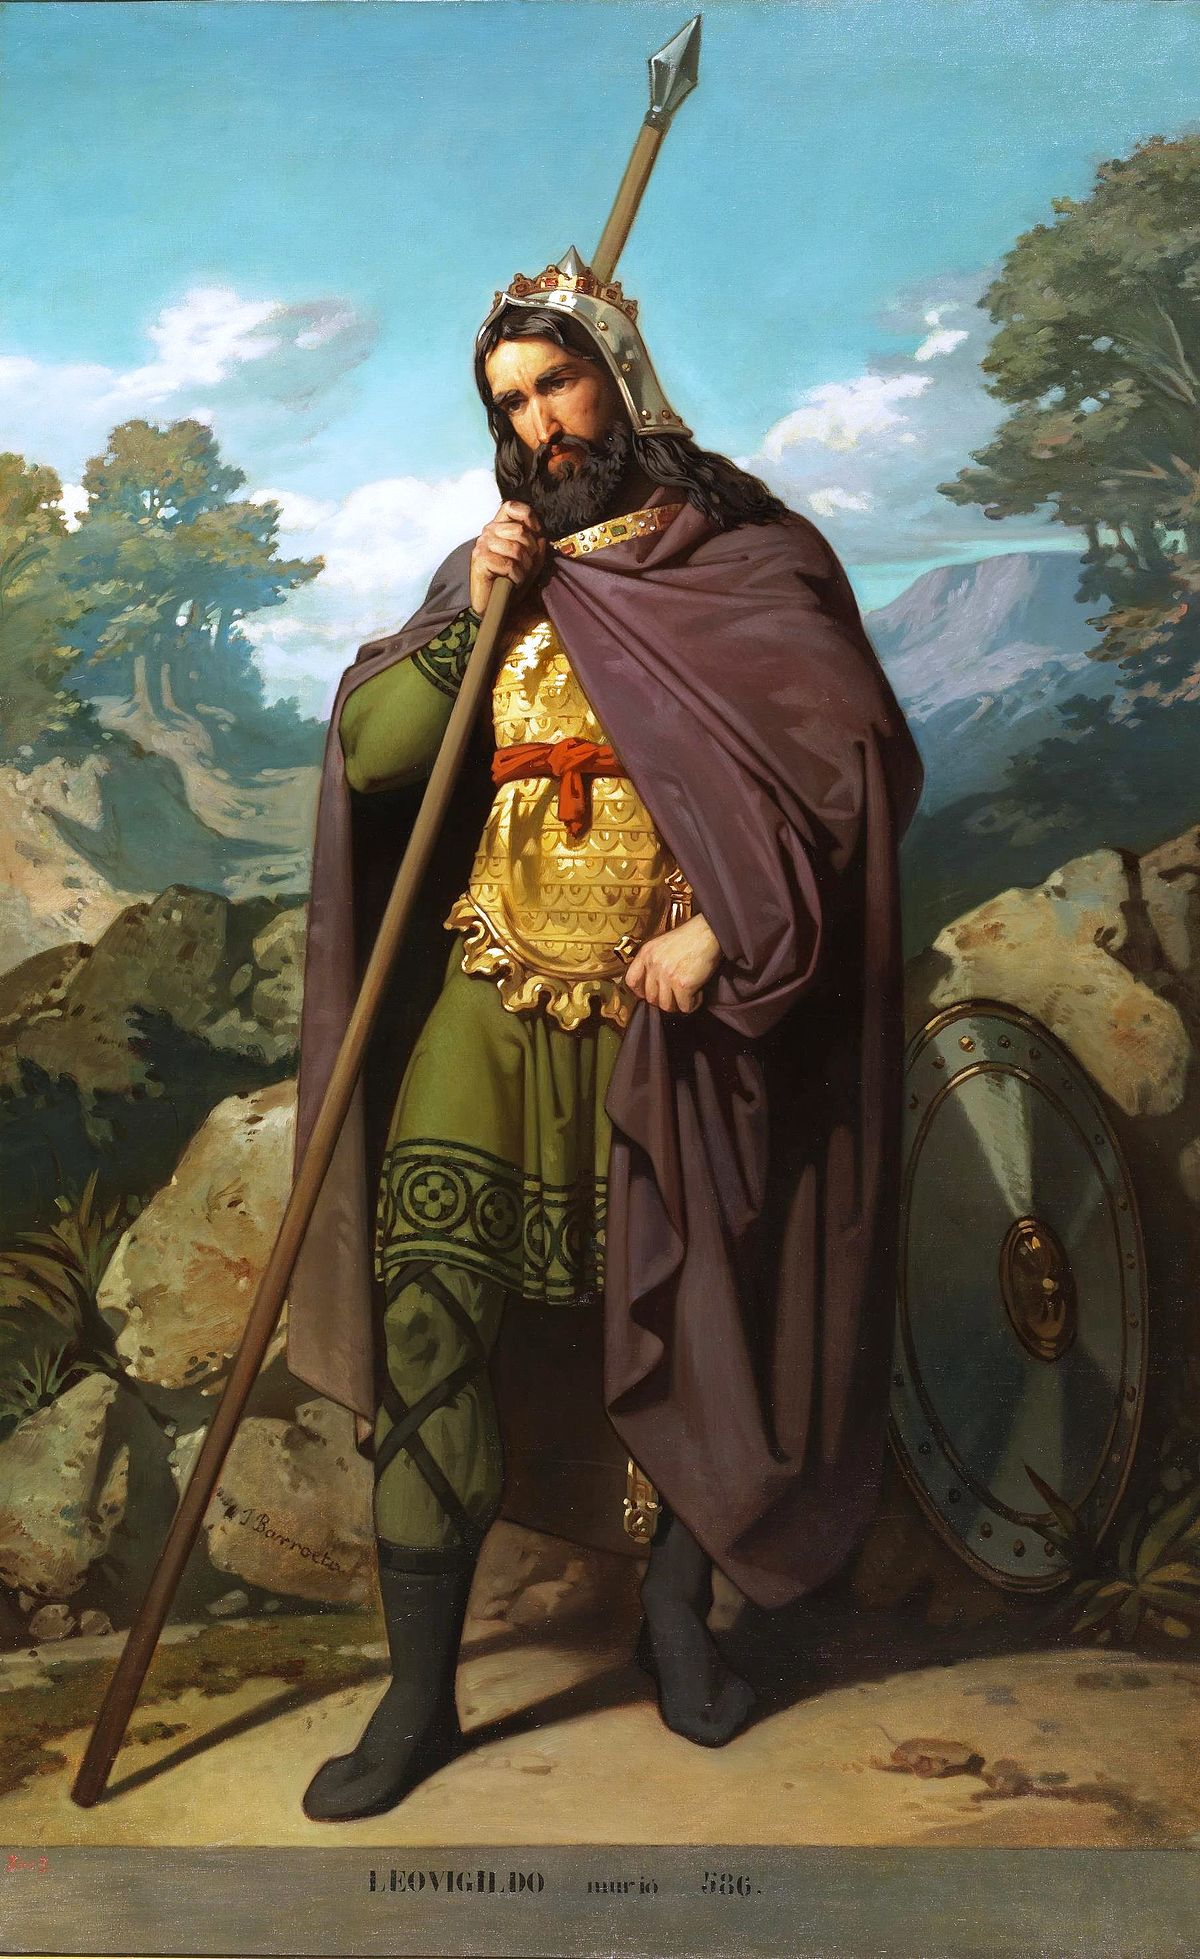 Leovigildo wikipedia la enciclopedia libre - El rey del tresillo ...